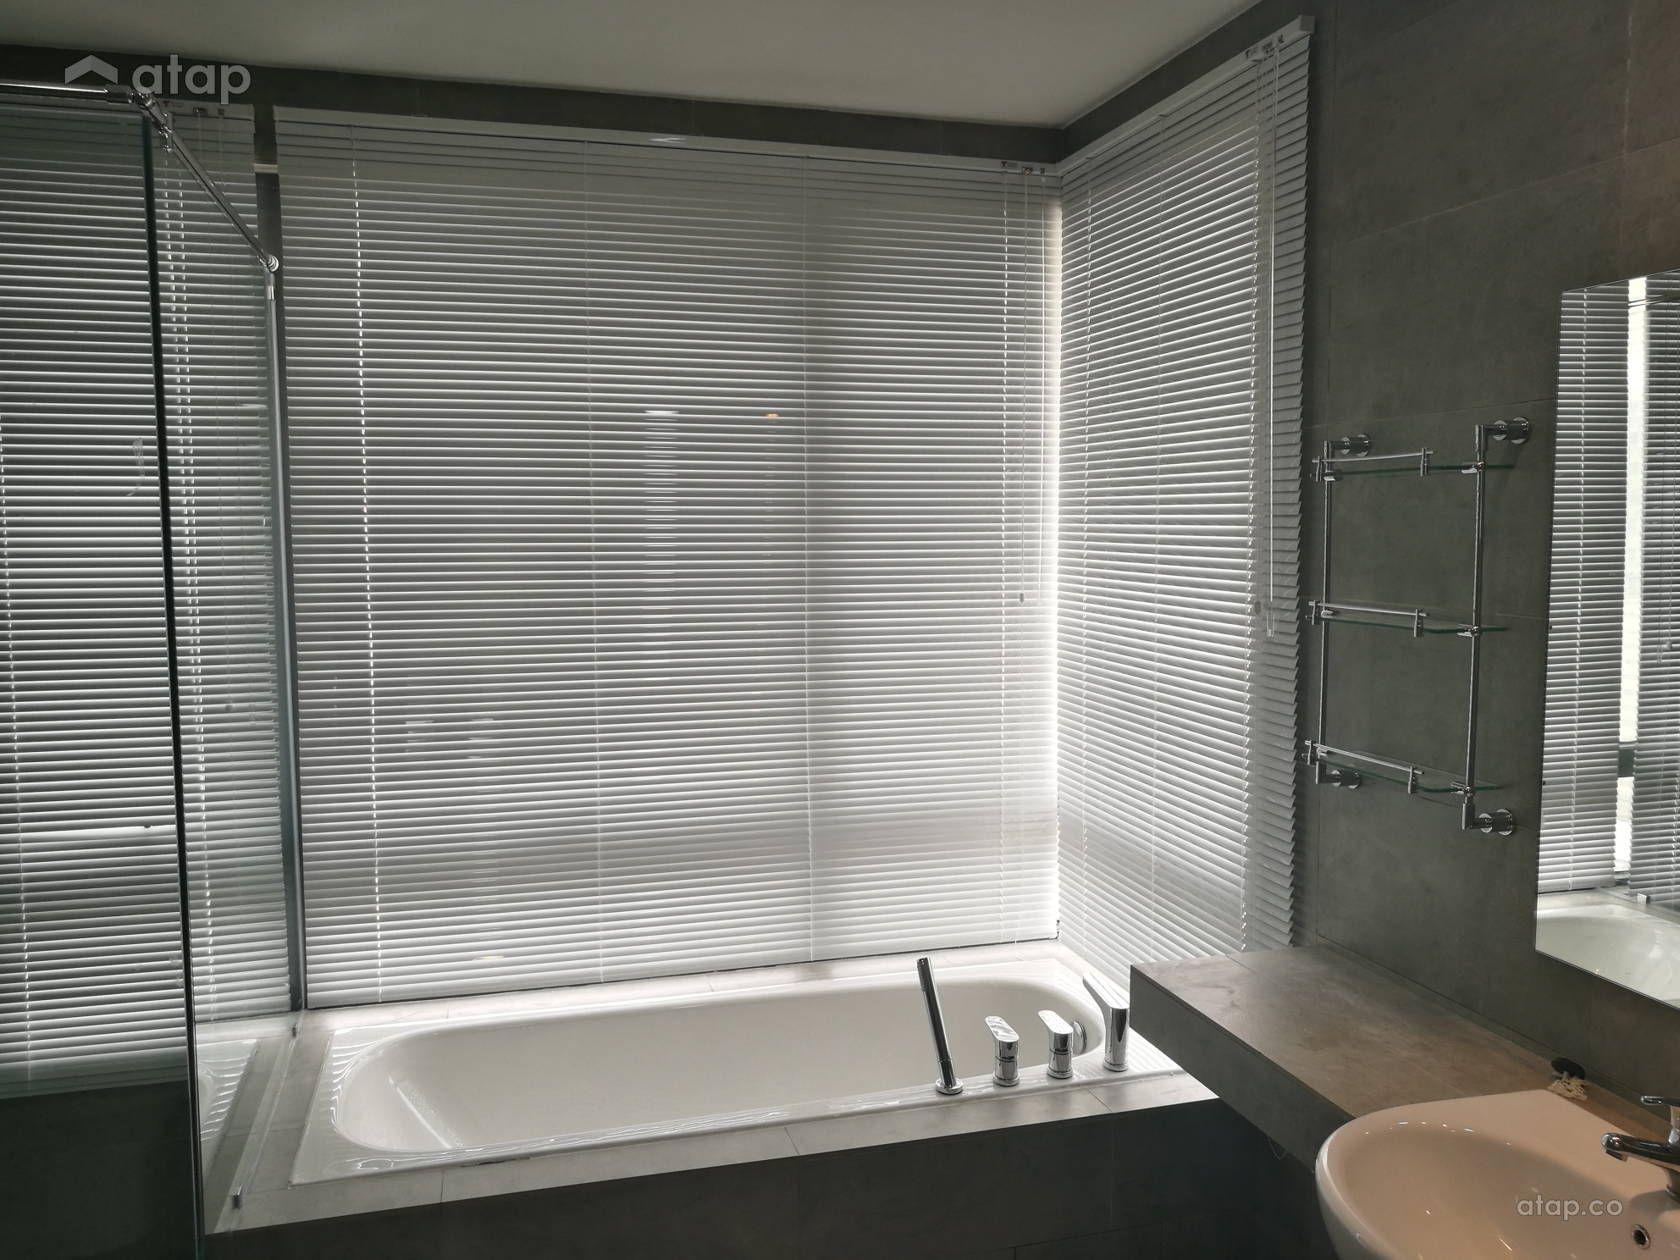 Modern Bathroom Condominium Design Ideas Photos Malaysia Atap Co Condominium Design Modern Bathroom Bathroom